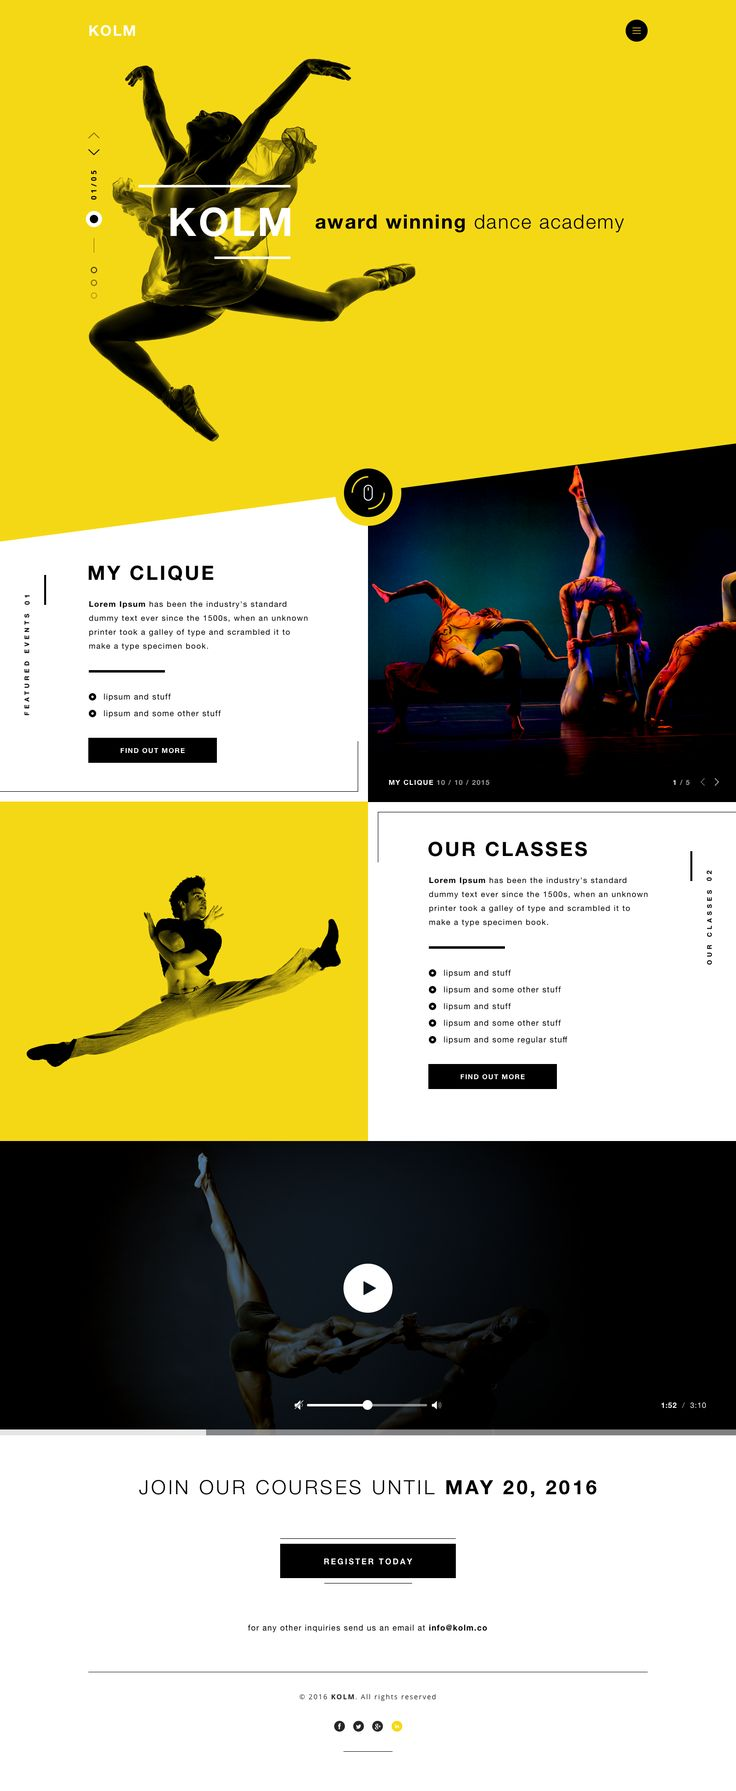 #webdesign #inspiration - Follow my webdesign board on Pinterest: http://lvn.io/cscwebdesign